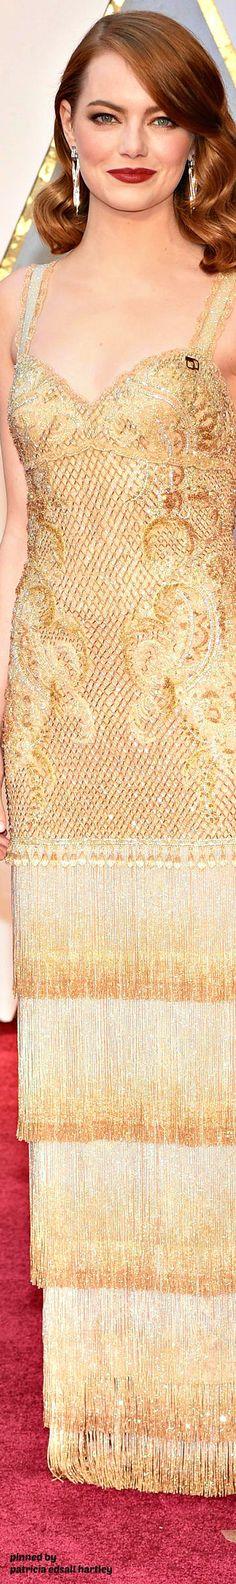 2017 Oscars. Academy Award Winner and one of the Best Dressed, Emma Stone. Follow rickysturn/amazing-women